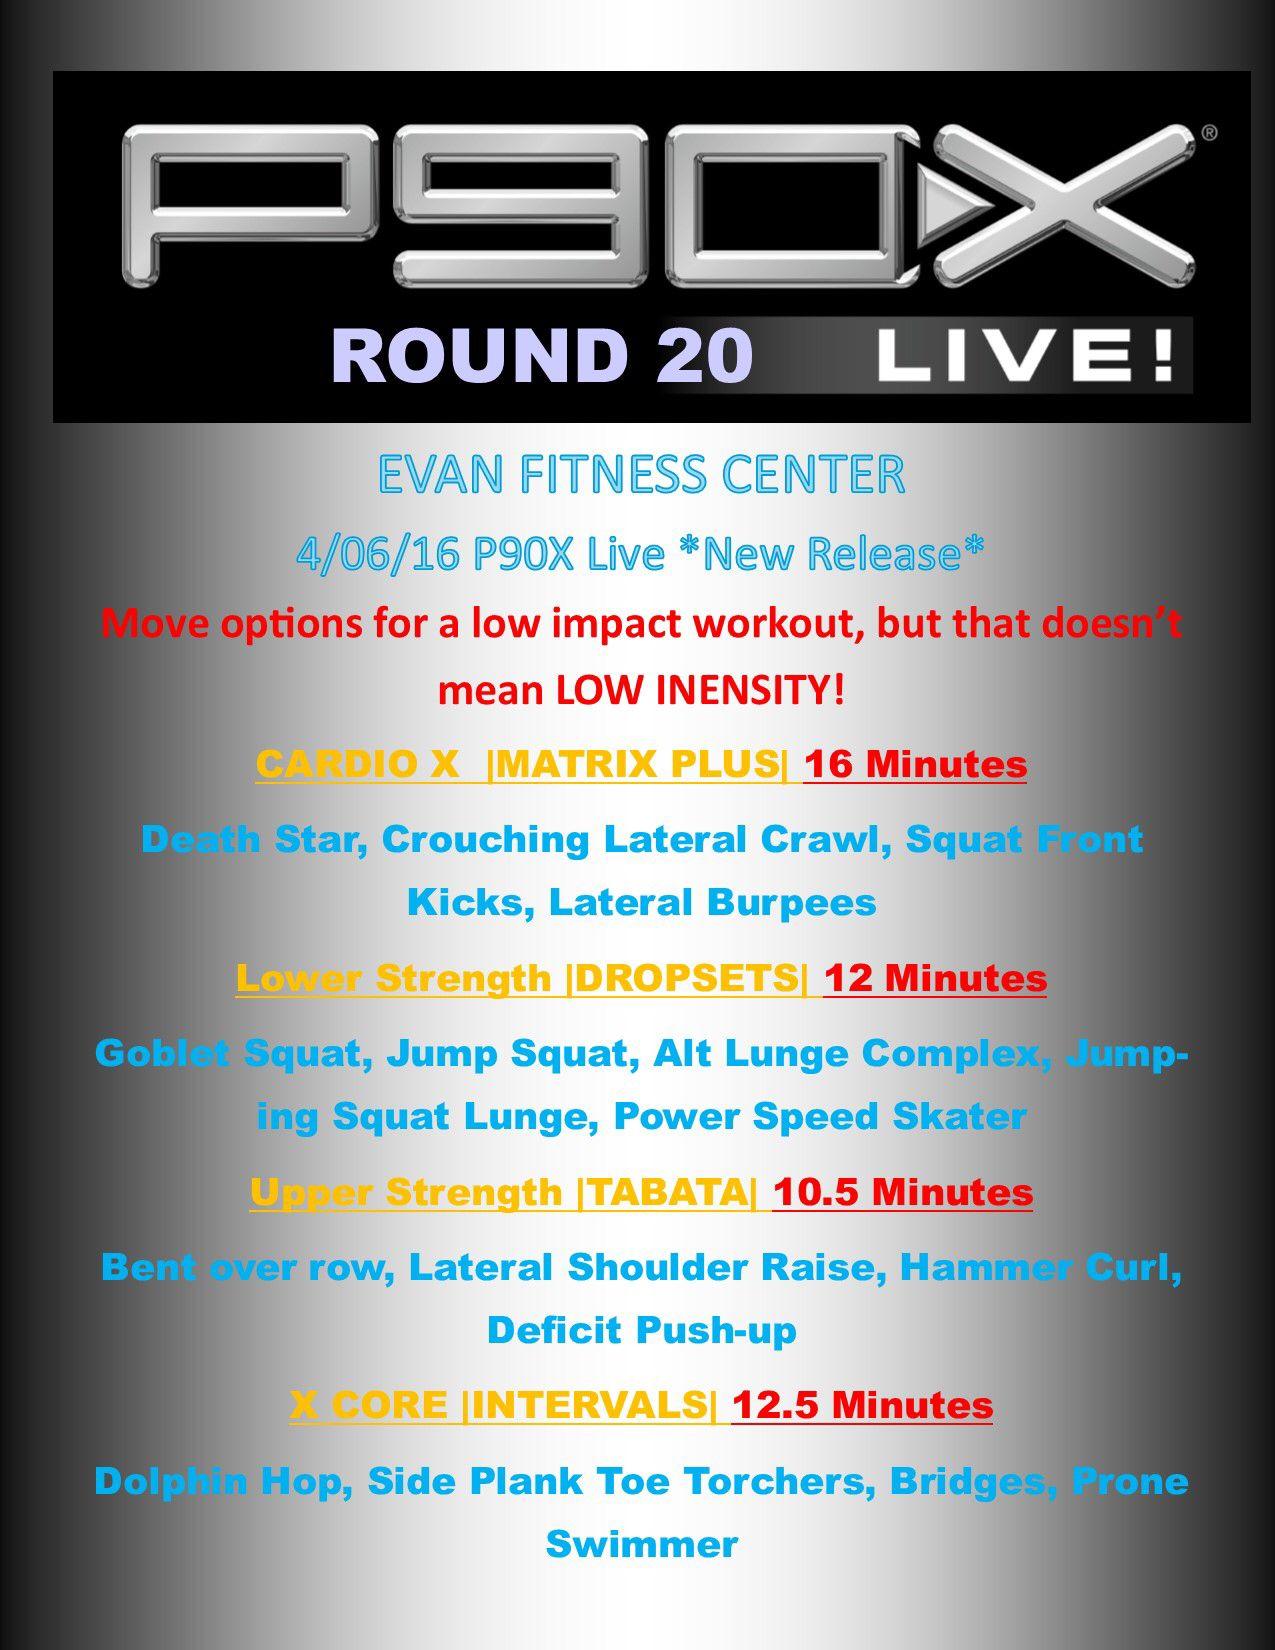 P90x Workout Routine Details